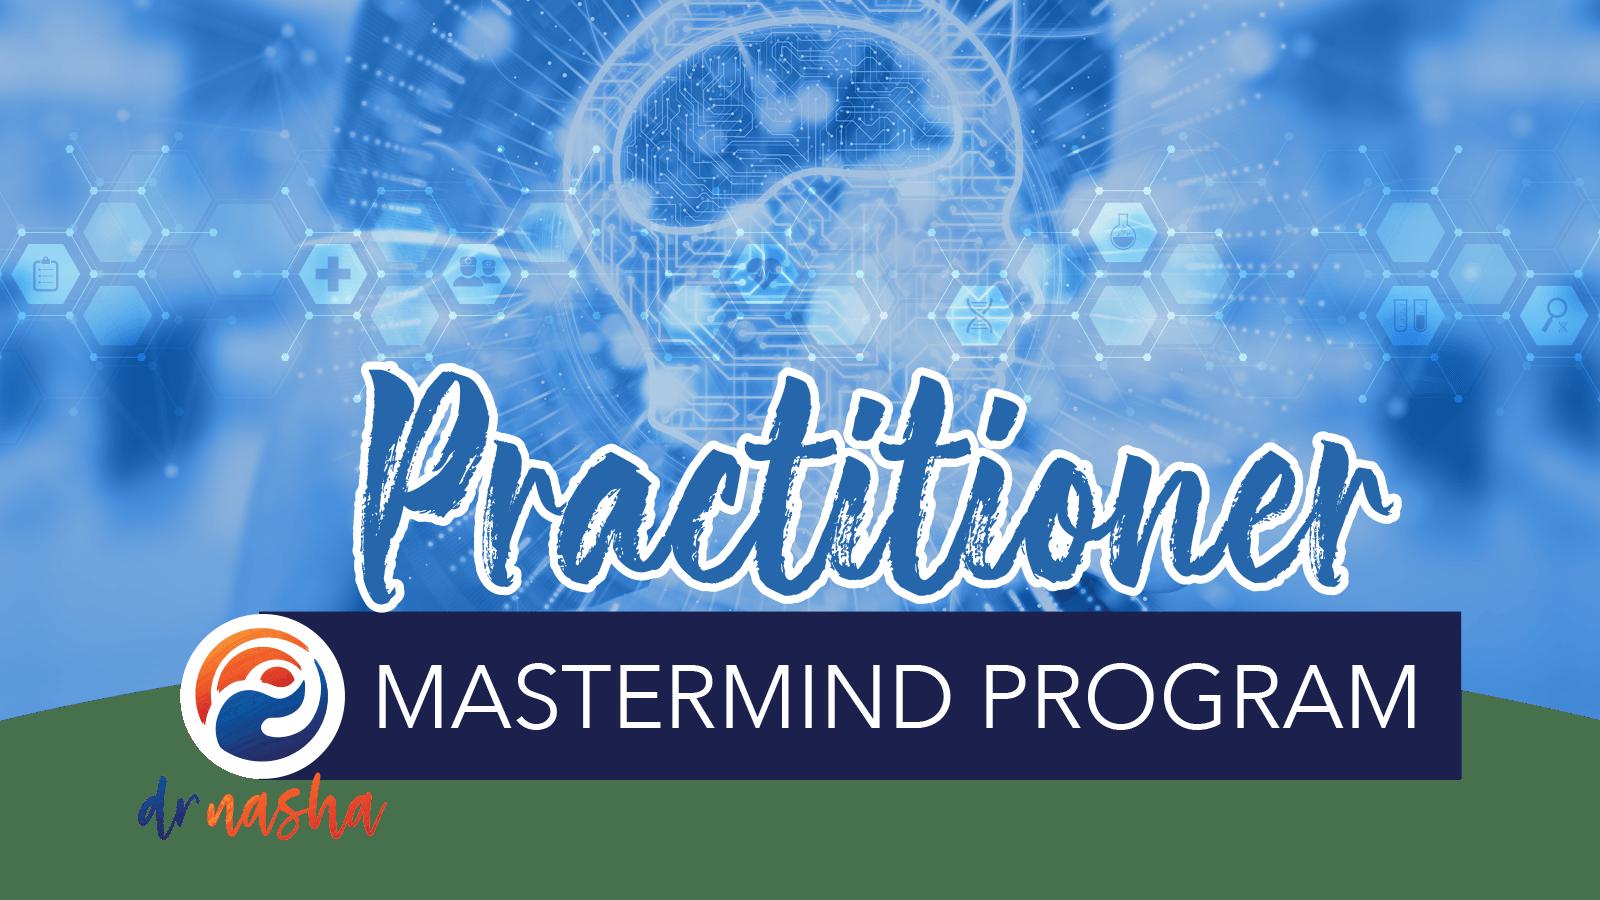 Practitioner Mastermind Program - MATC